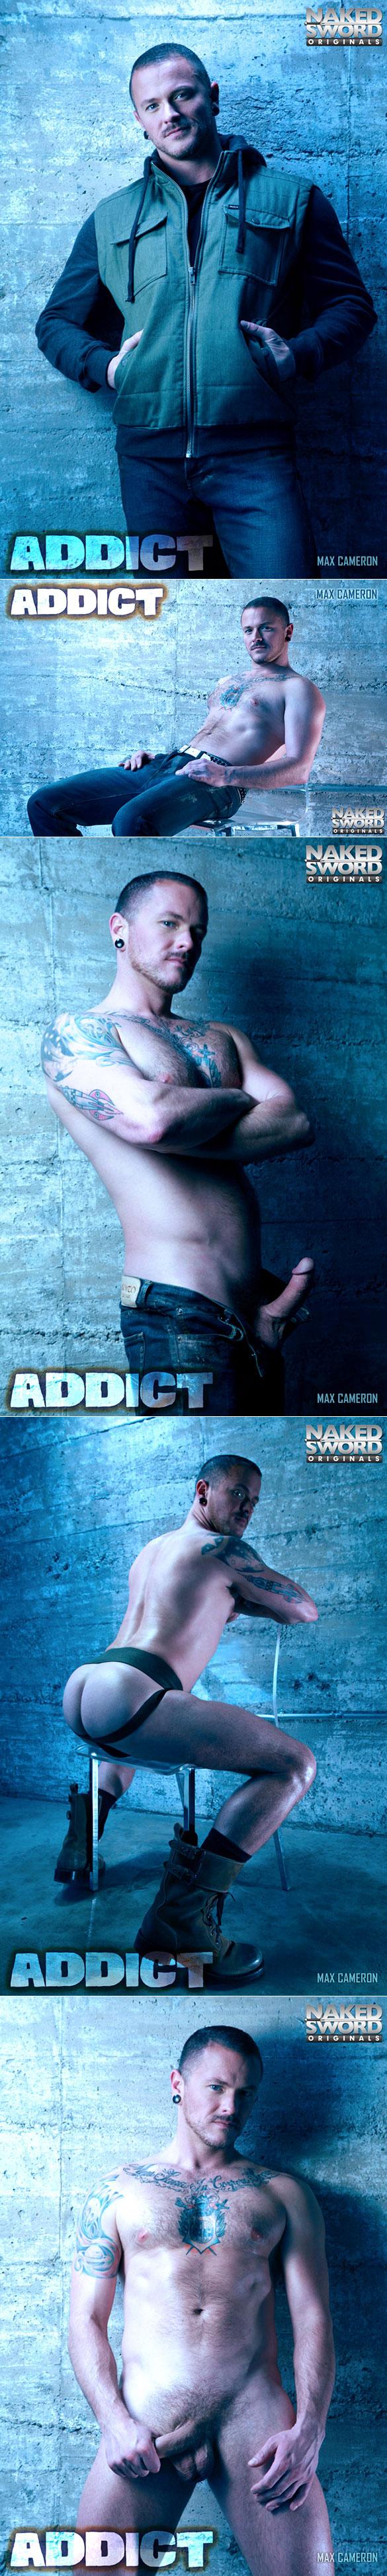 "Naked Sword Originals: Trenton Ducati and Max Cameron flip fuck in ""Addict, Episode 1: Addicted To Power"""